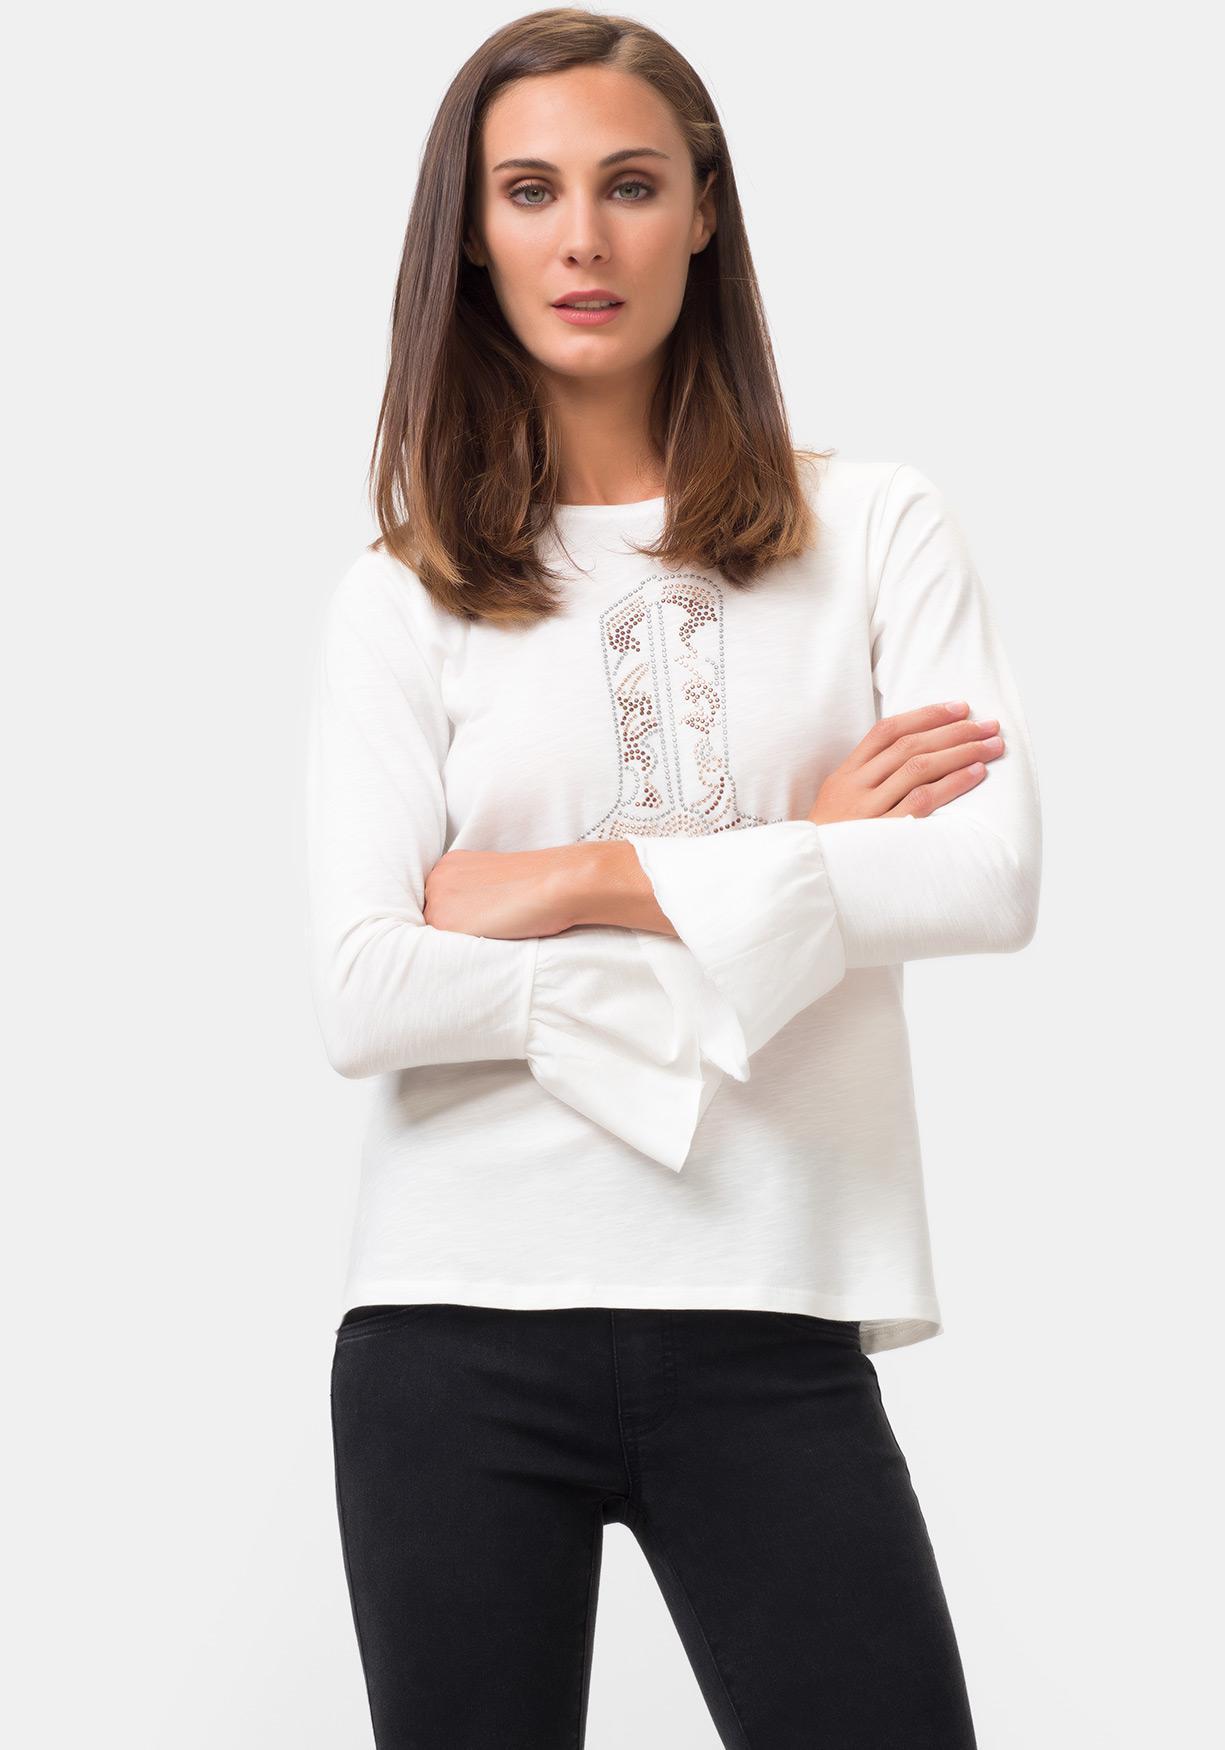 Comprar Camiseta con manga larga para mujer TEX. ¡Aprovéchate de ... 86704b6c355d